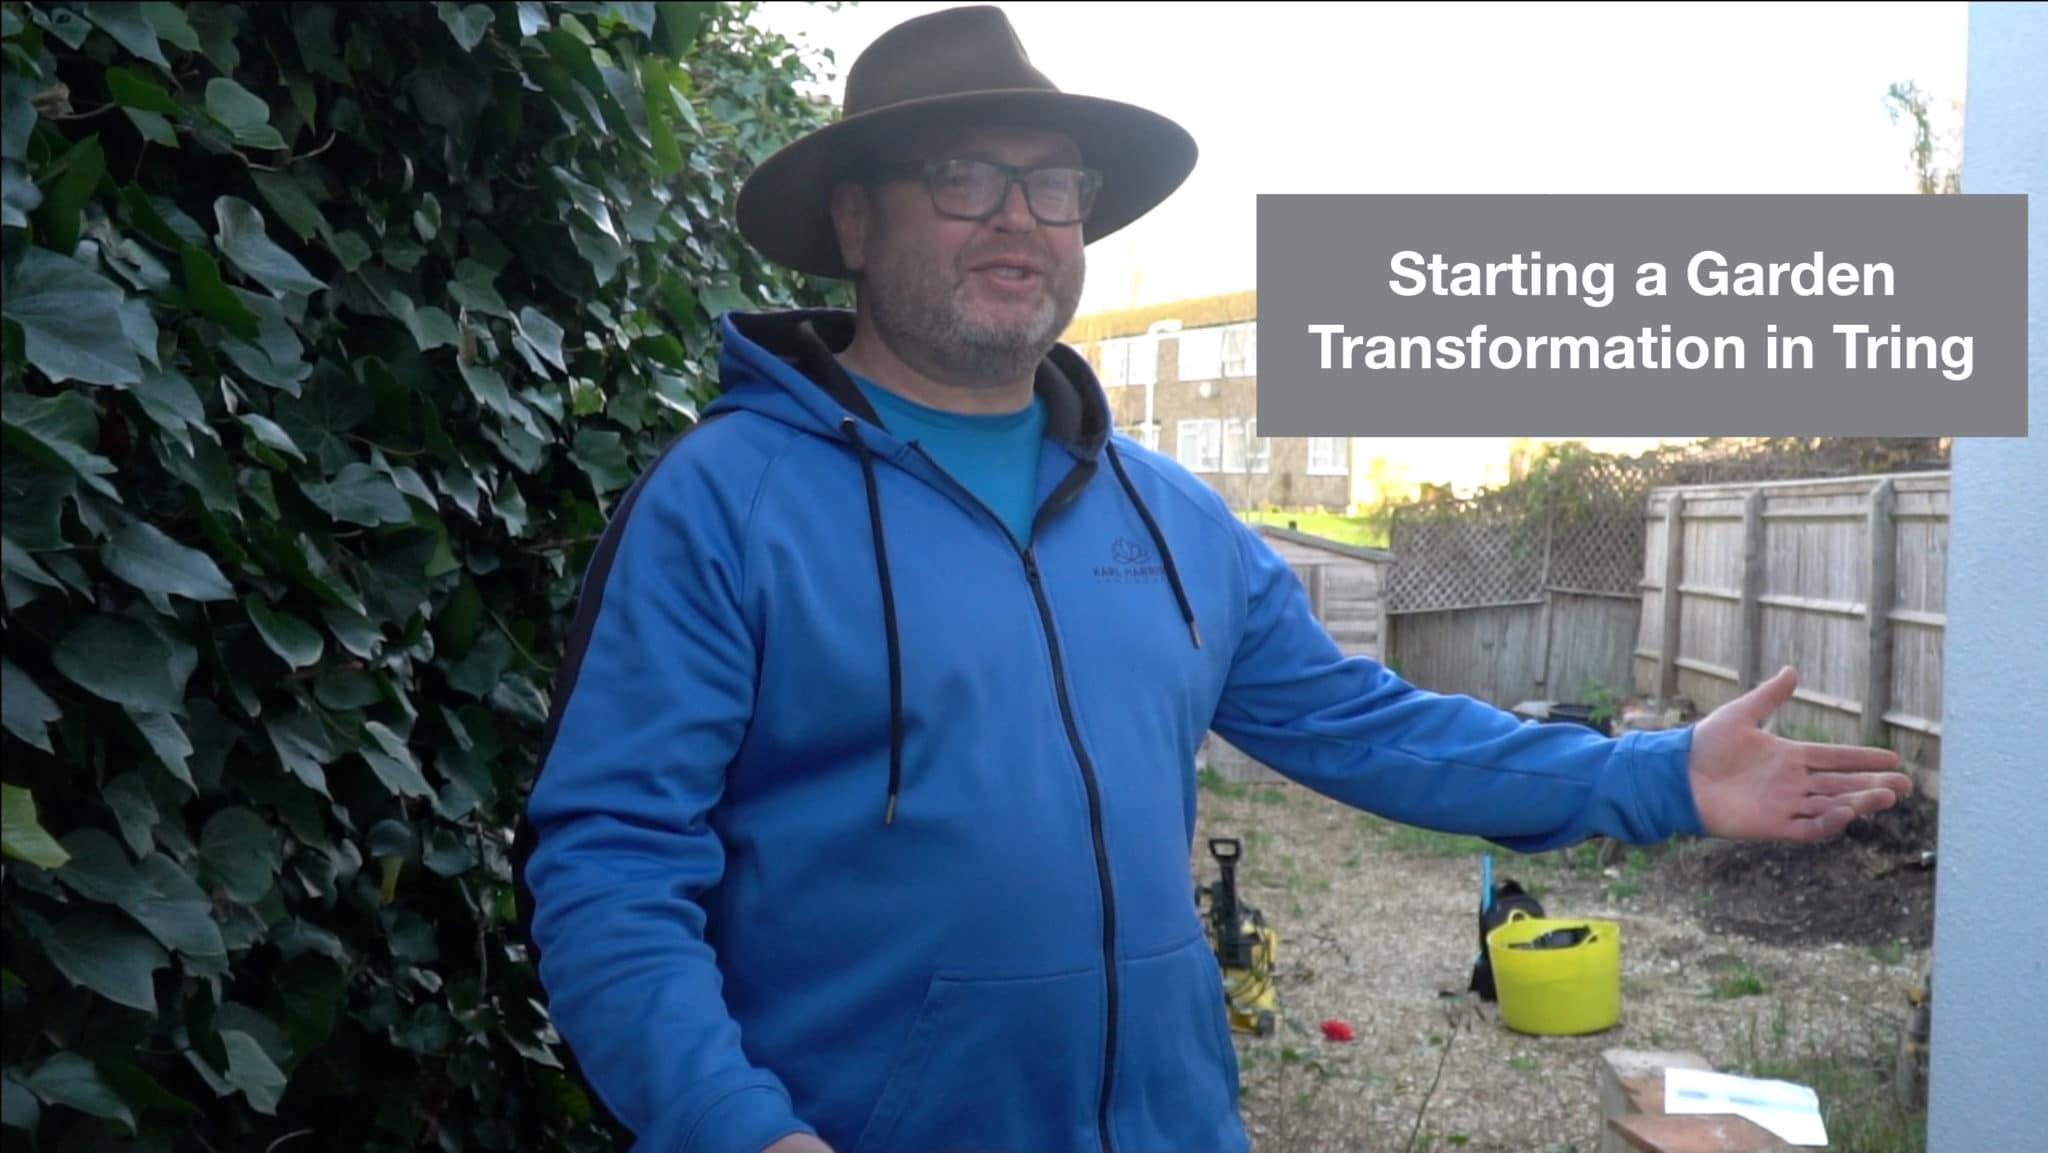 Starting a Garden Transformation in Tring